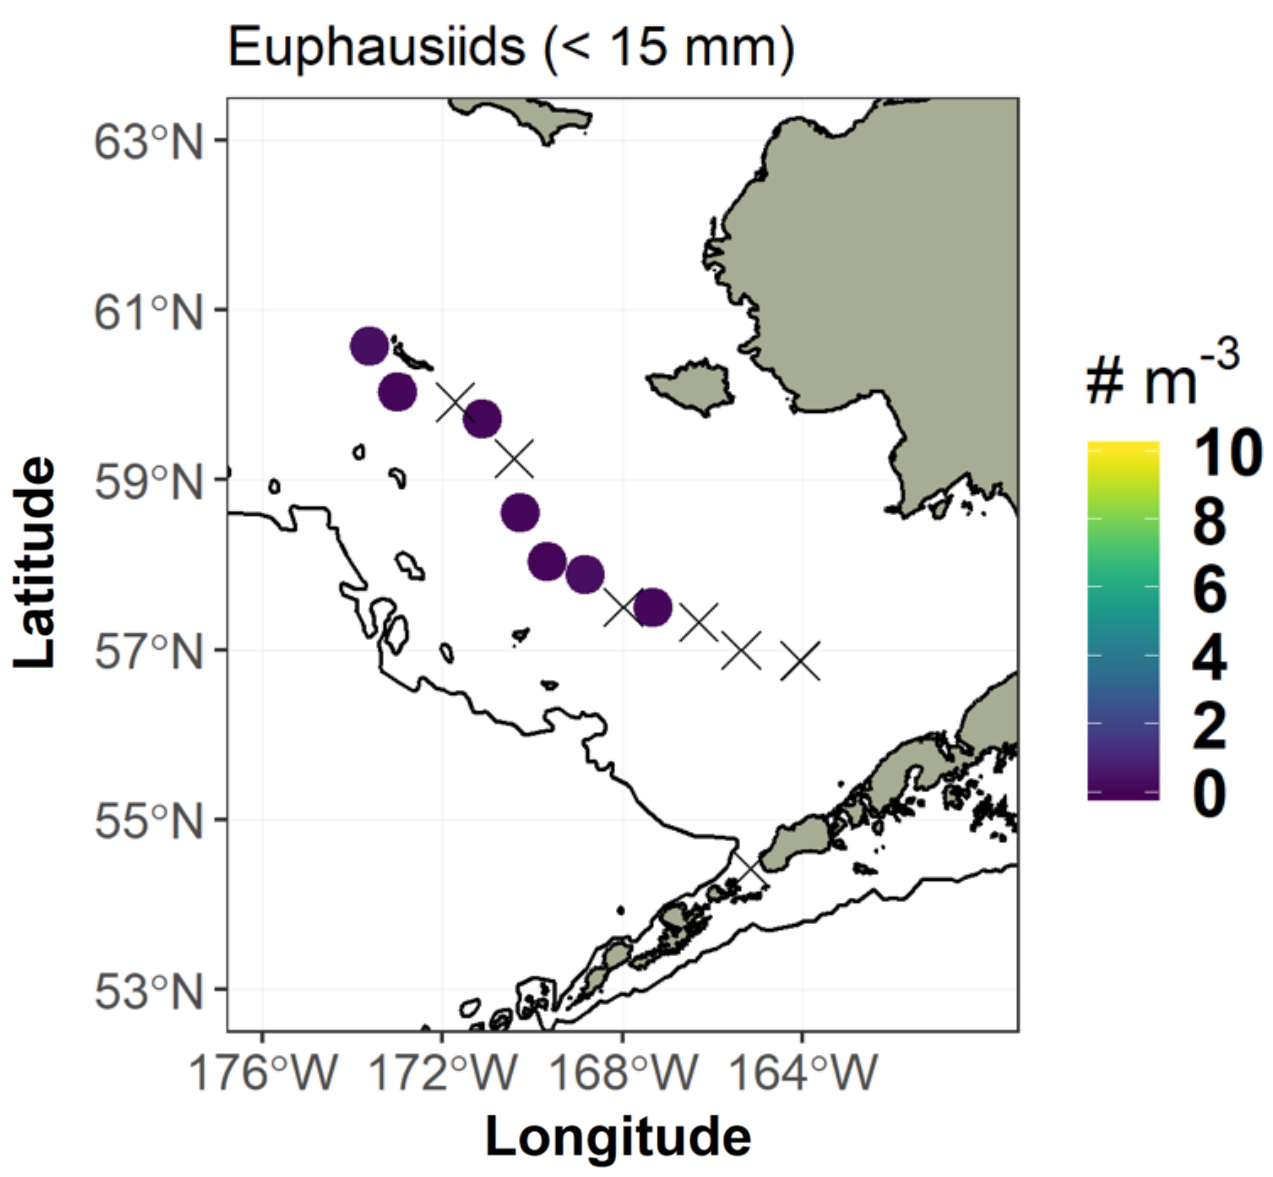 Bering Sea map plotting Euphausiids (< 15 mm).